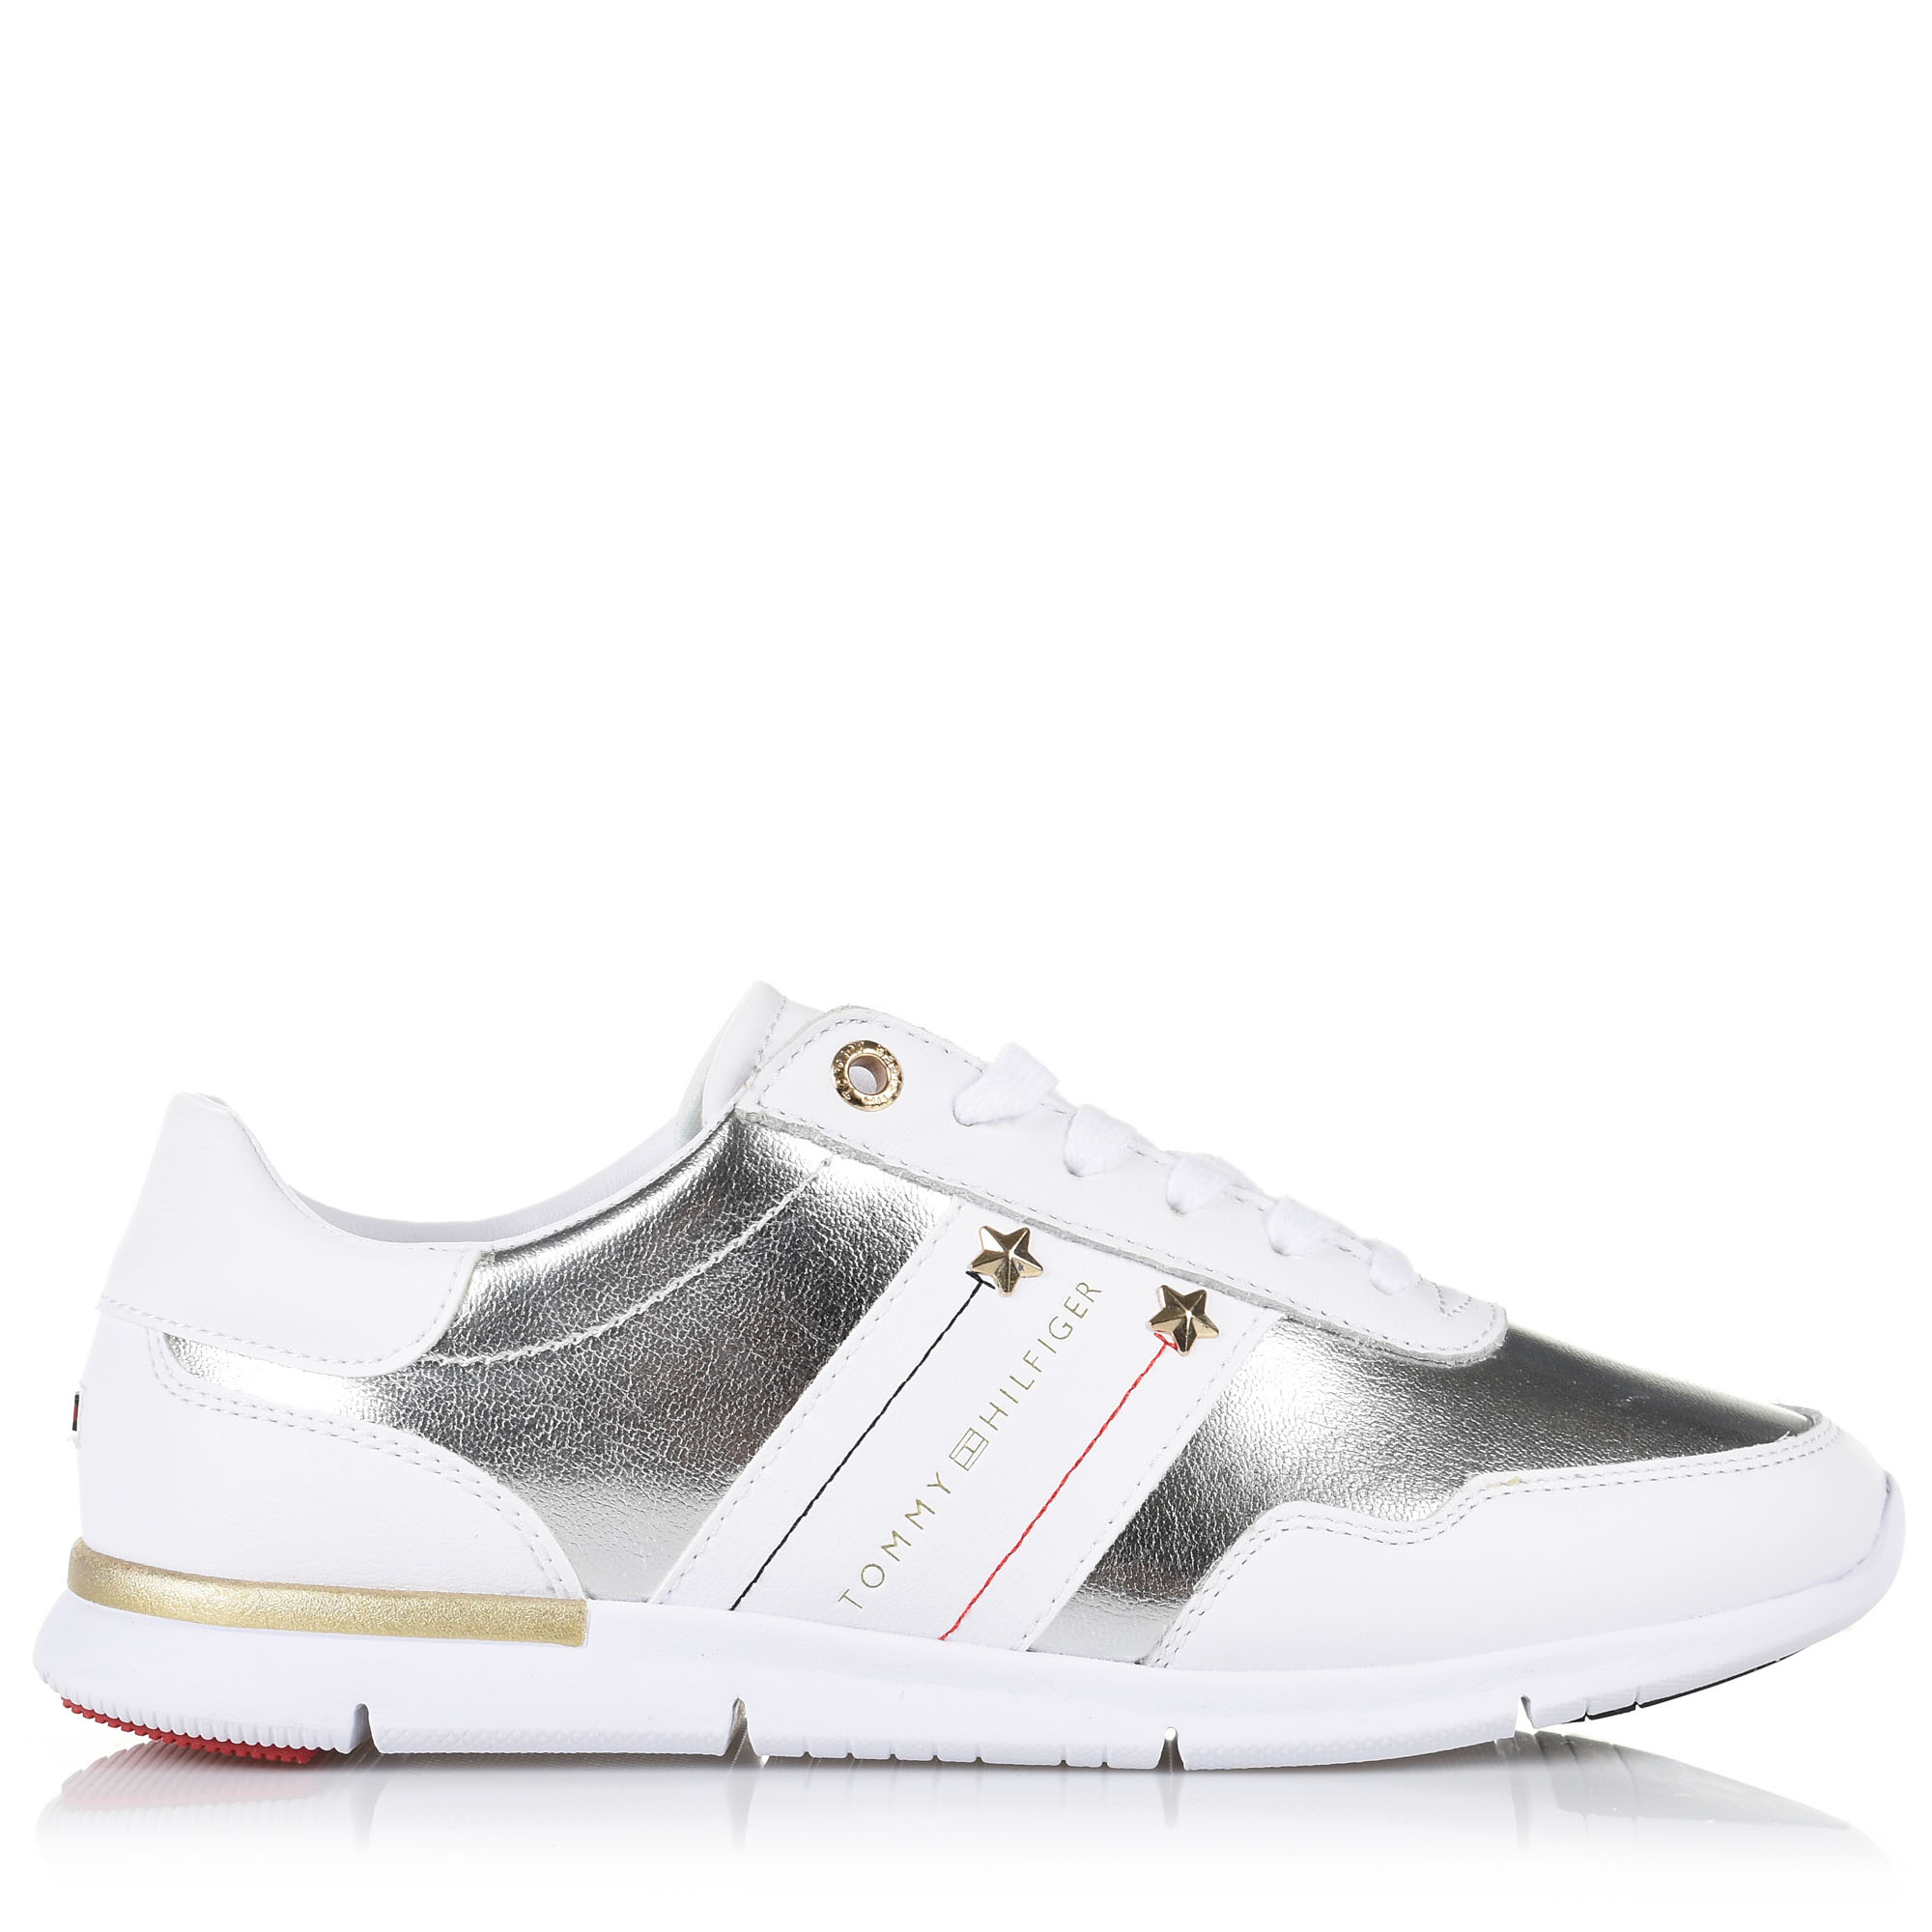 Sneakers Tommy Hilfiger FW0FW03688 γυναικα   γυναικείο παπούτσι